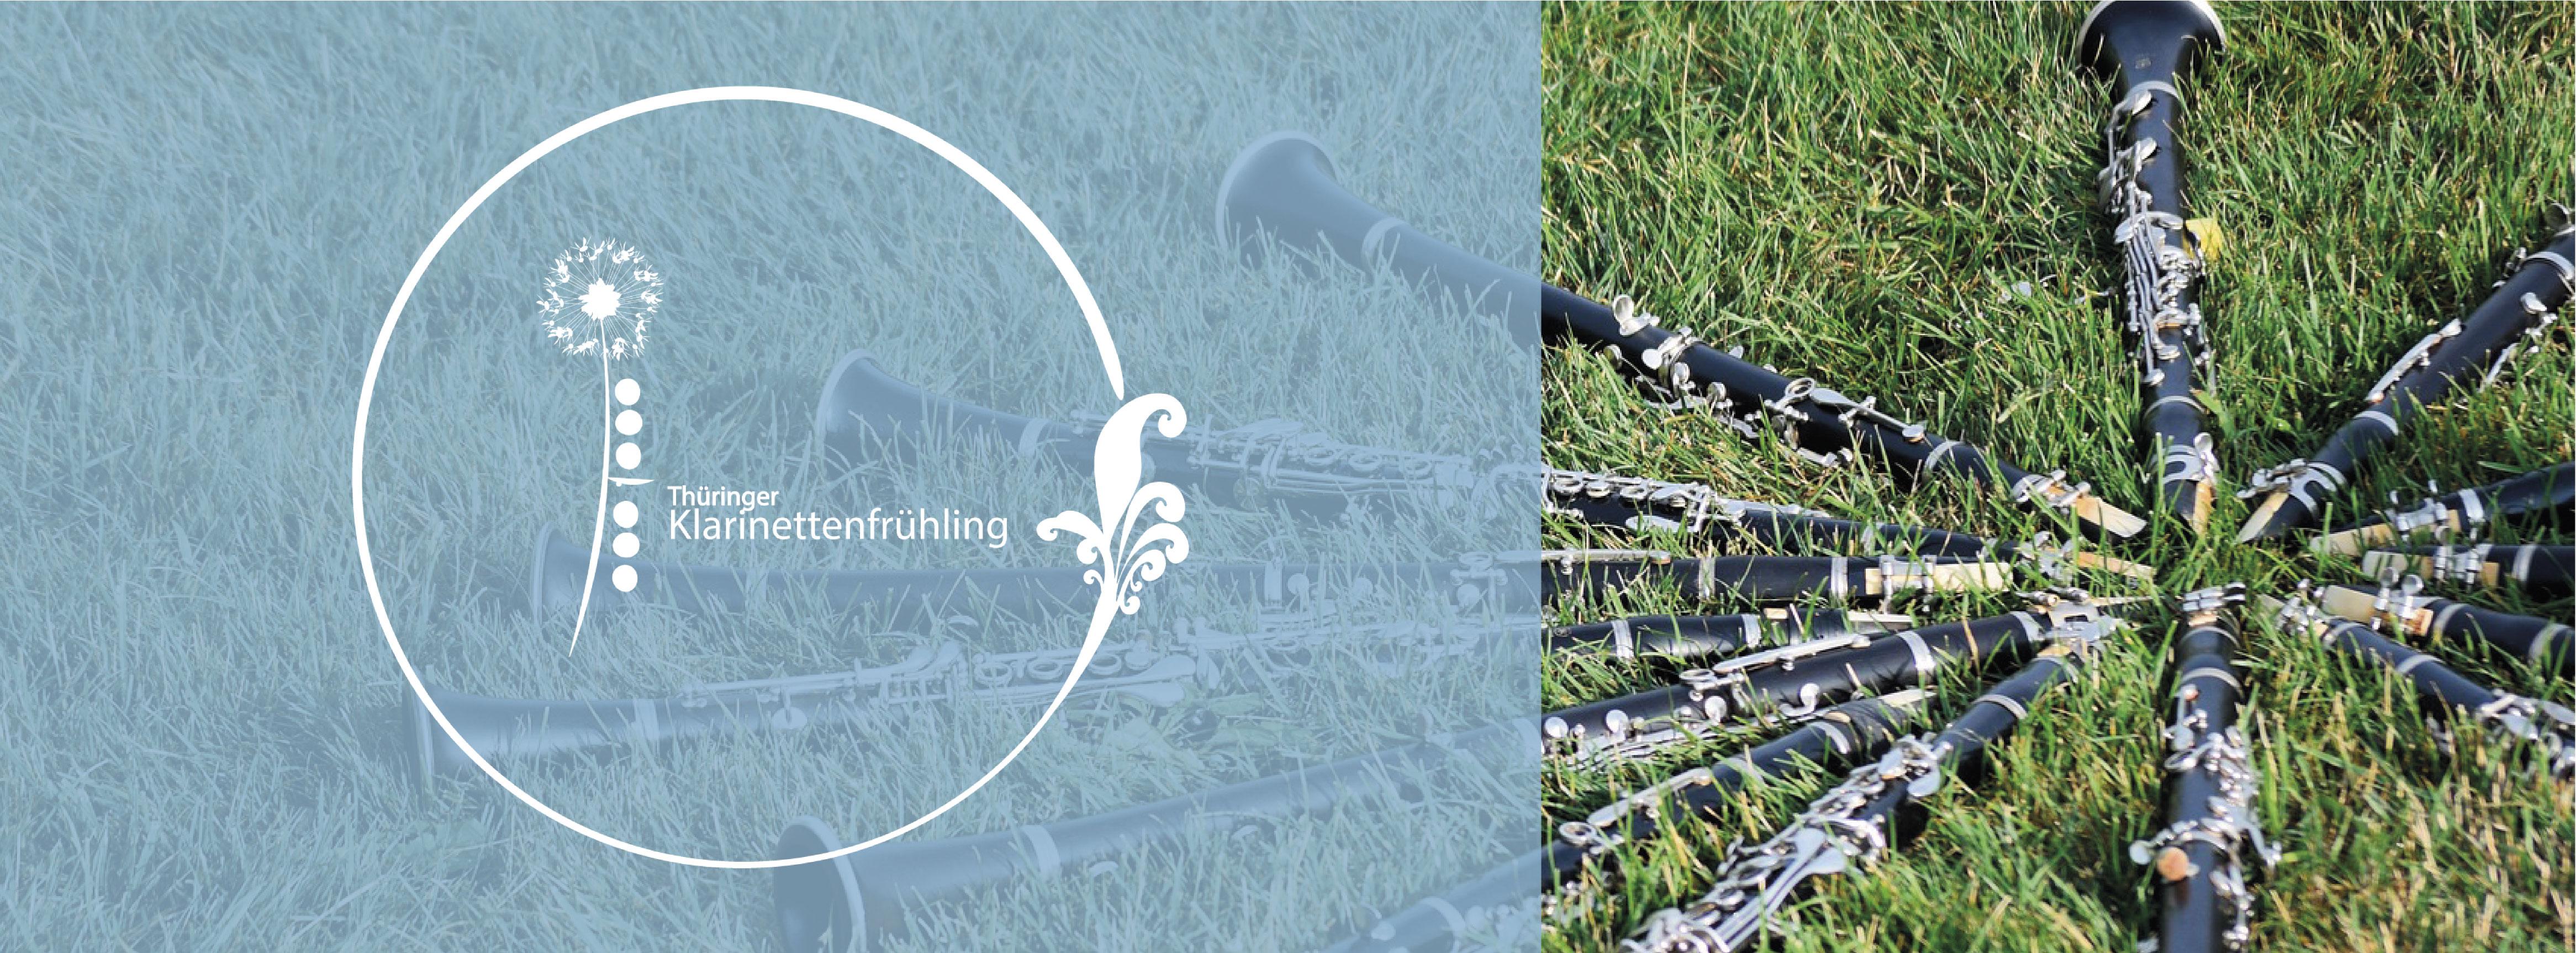 Thüringer Klarinettenfrühling